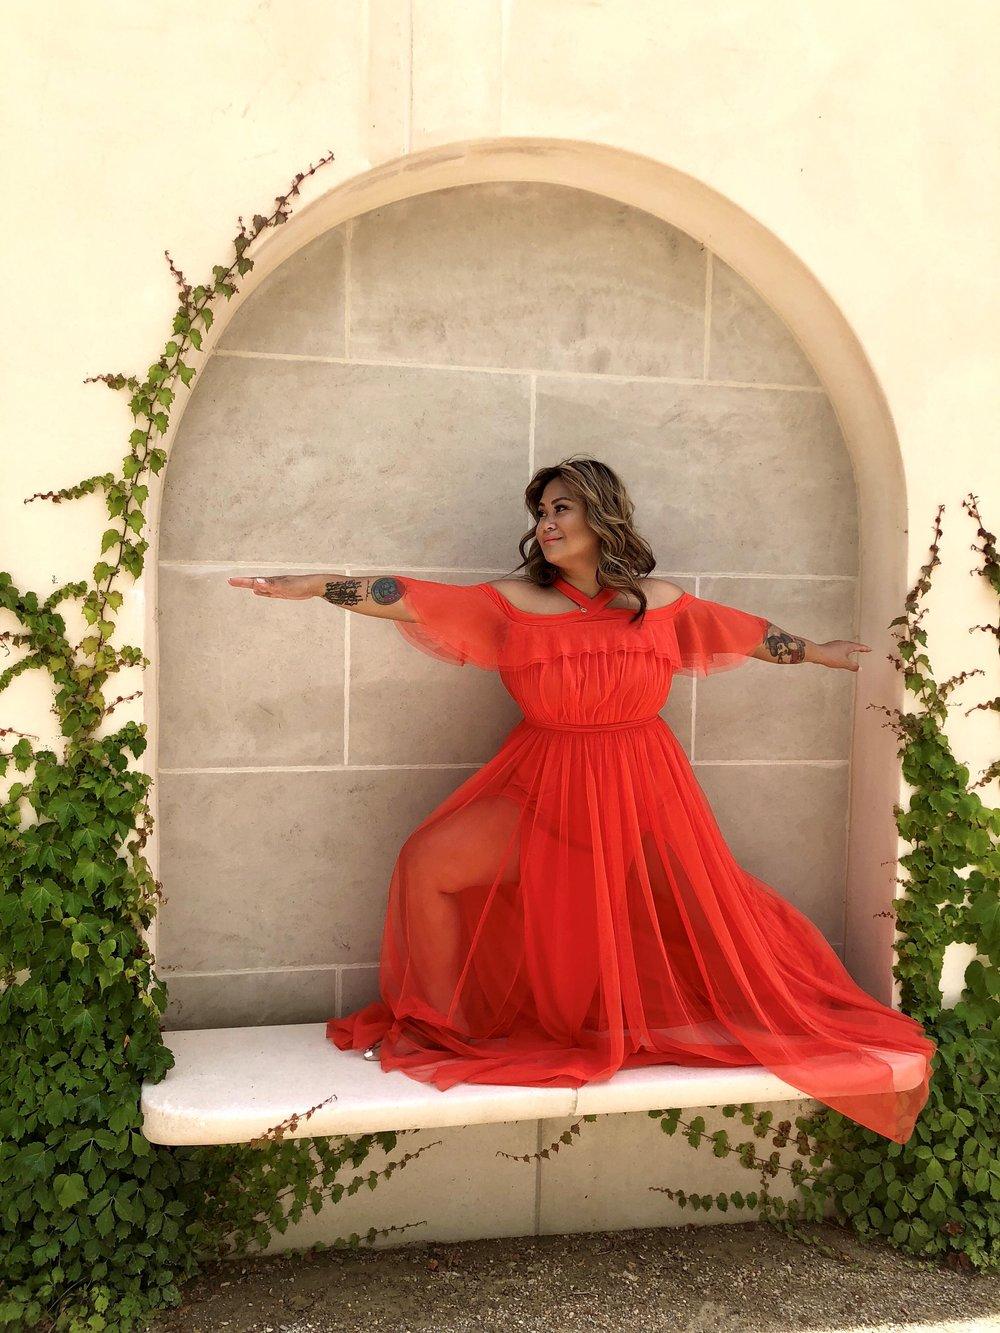 Krista Red Dress Pose .jpg